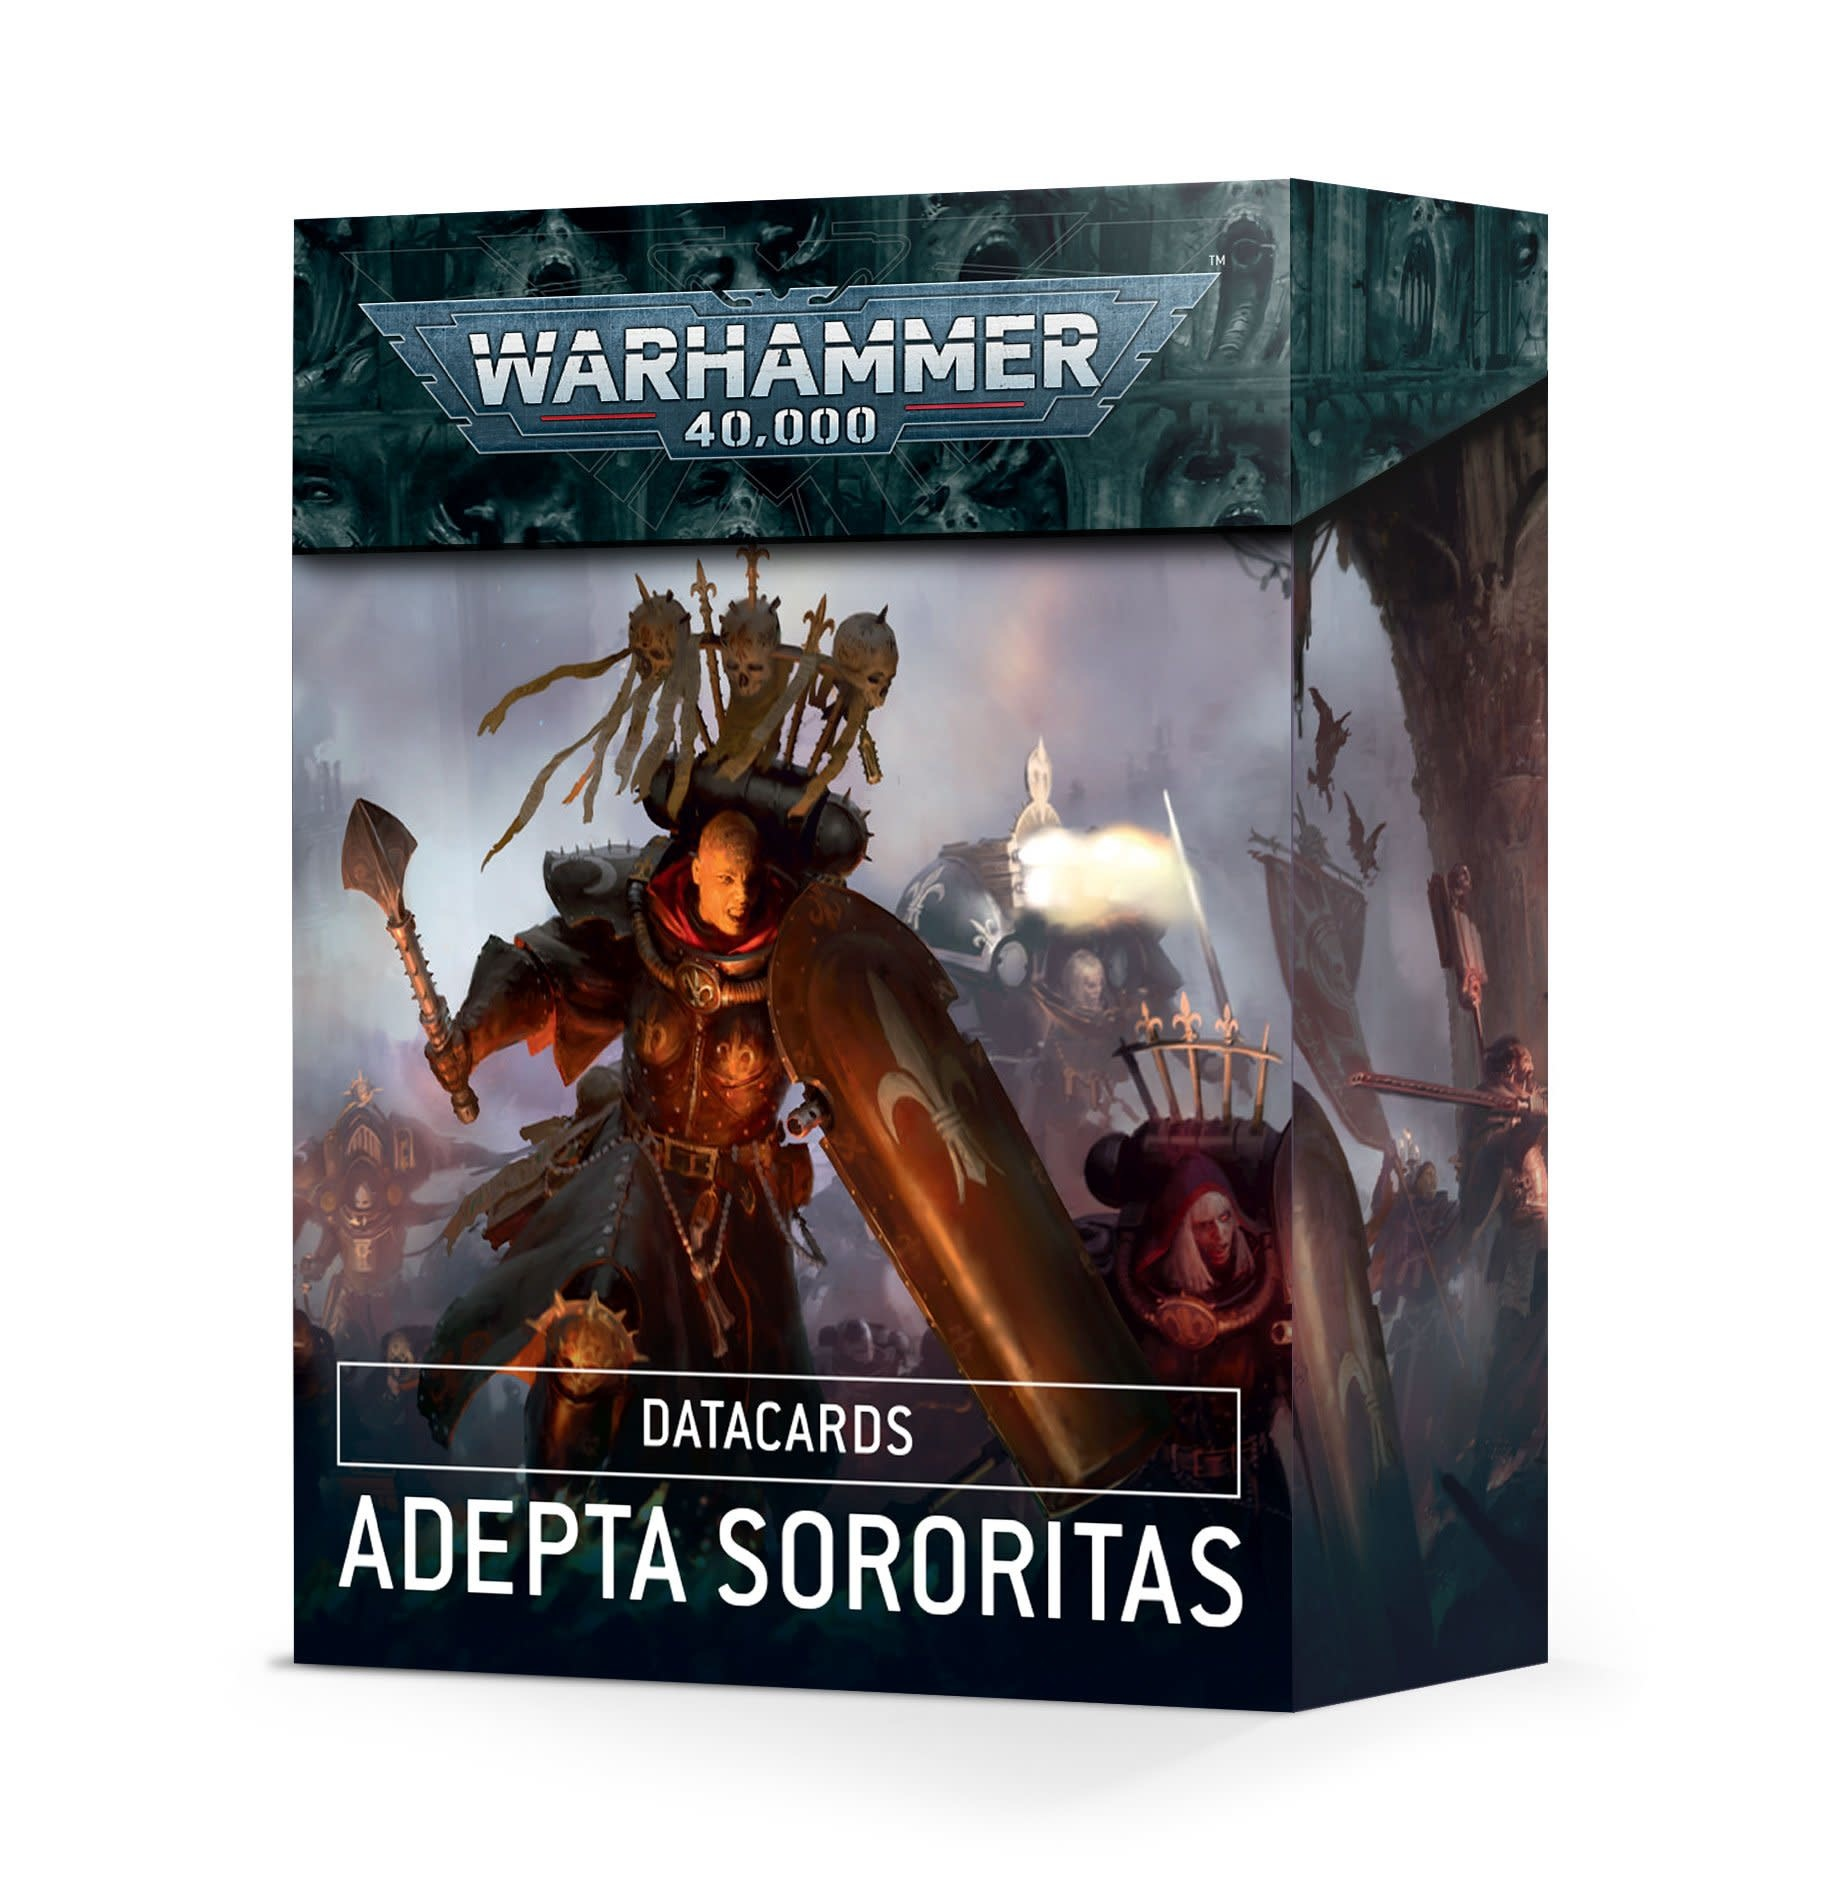 Games-Workshop Adepta Sororitas Datacards